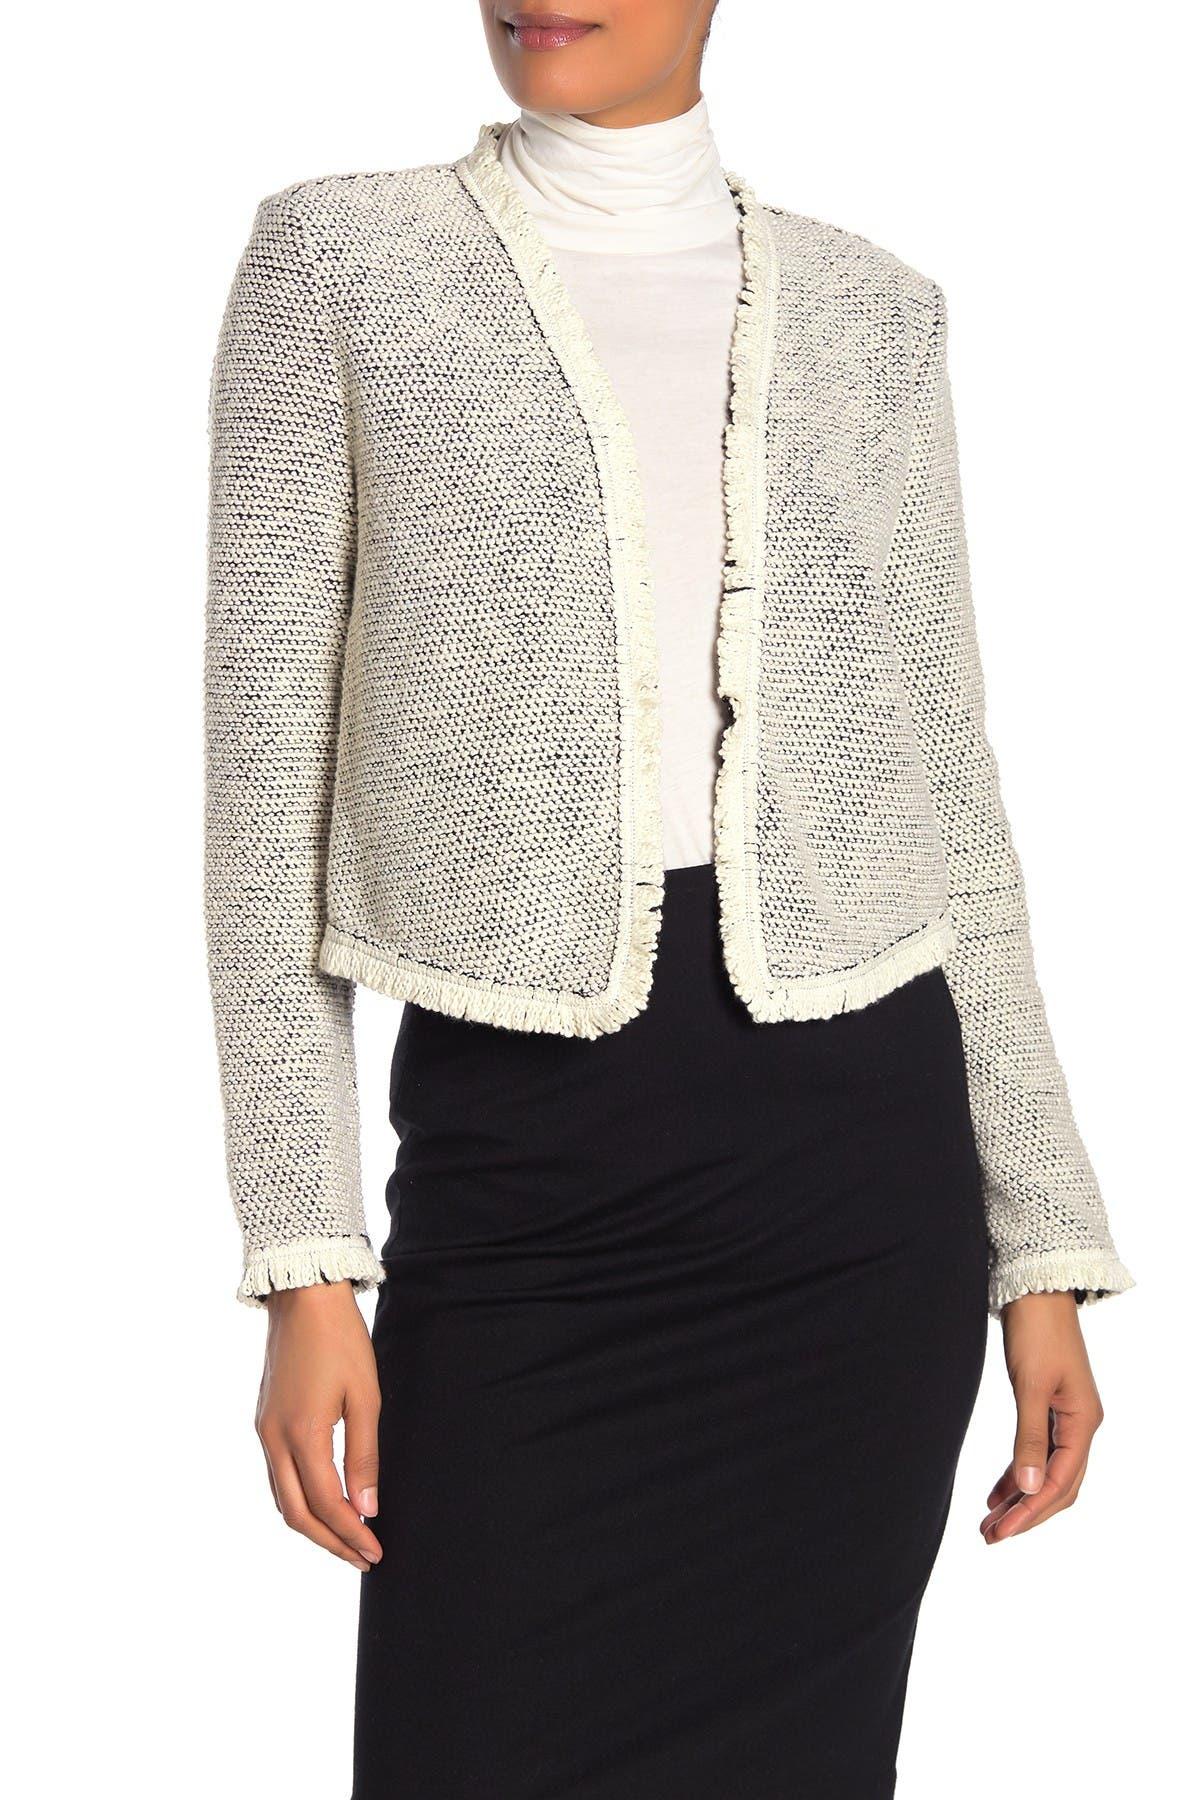 Image of Bagatelle Stretch Tweed Blazer